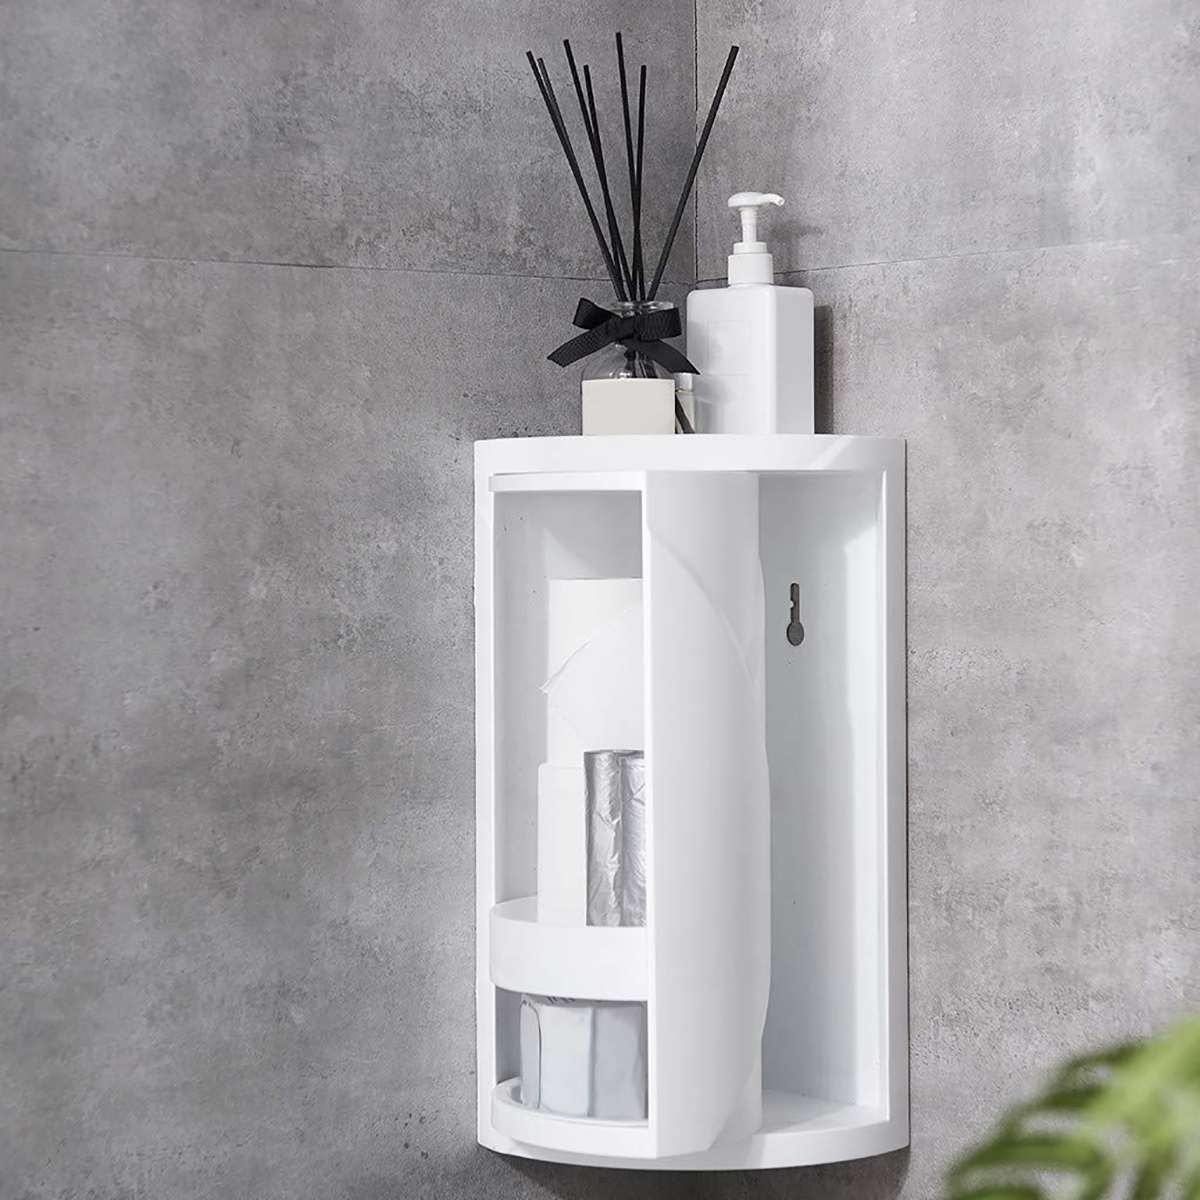 Rotatable Bathroom Shelf Plastic Triangle Storage Rack Wall-absorbing Cosmetic Storage Box Free Punching Bathroom Accessories